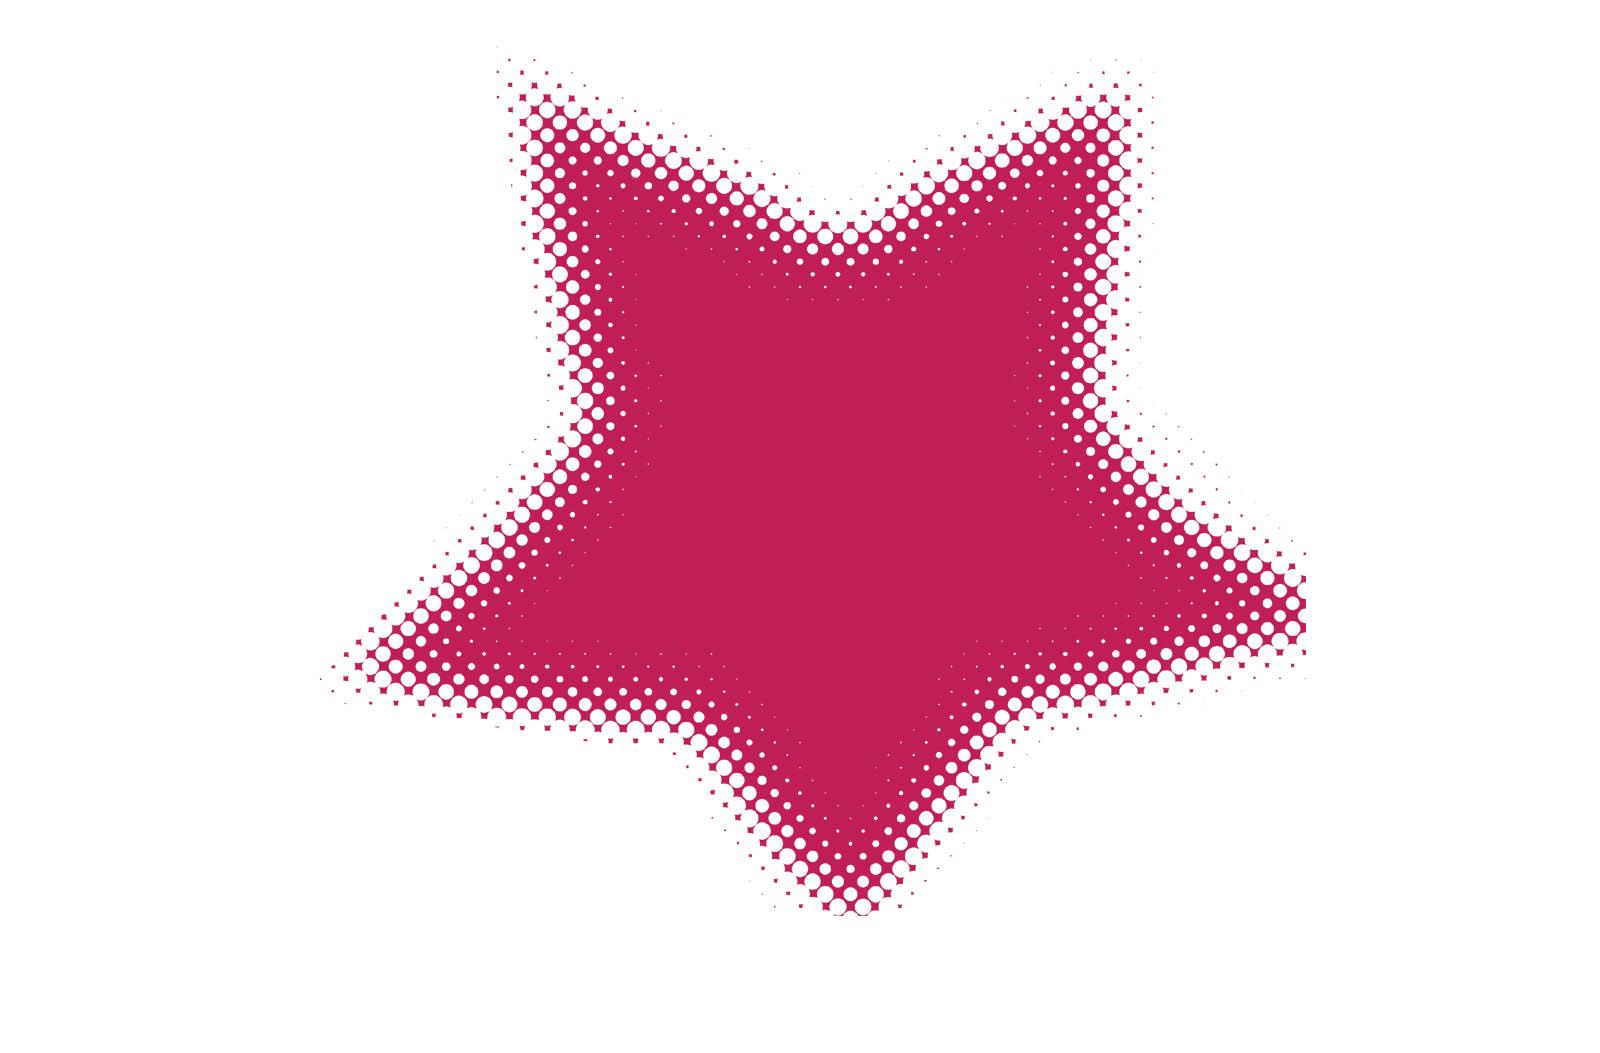 autocad图中的五角星是 怎么画 出来的图片